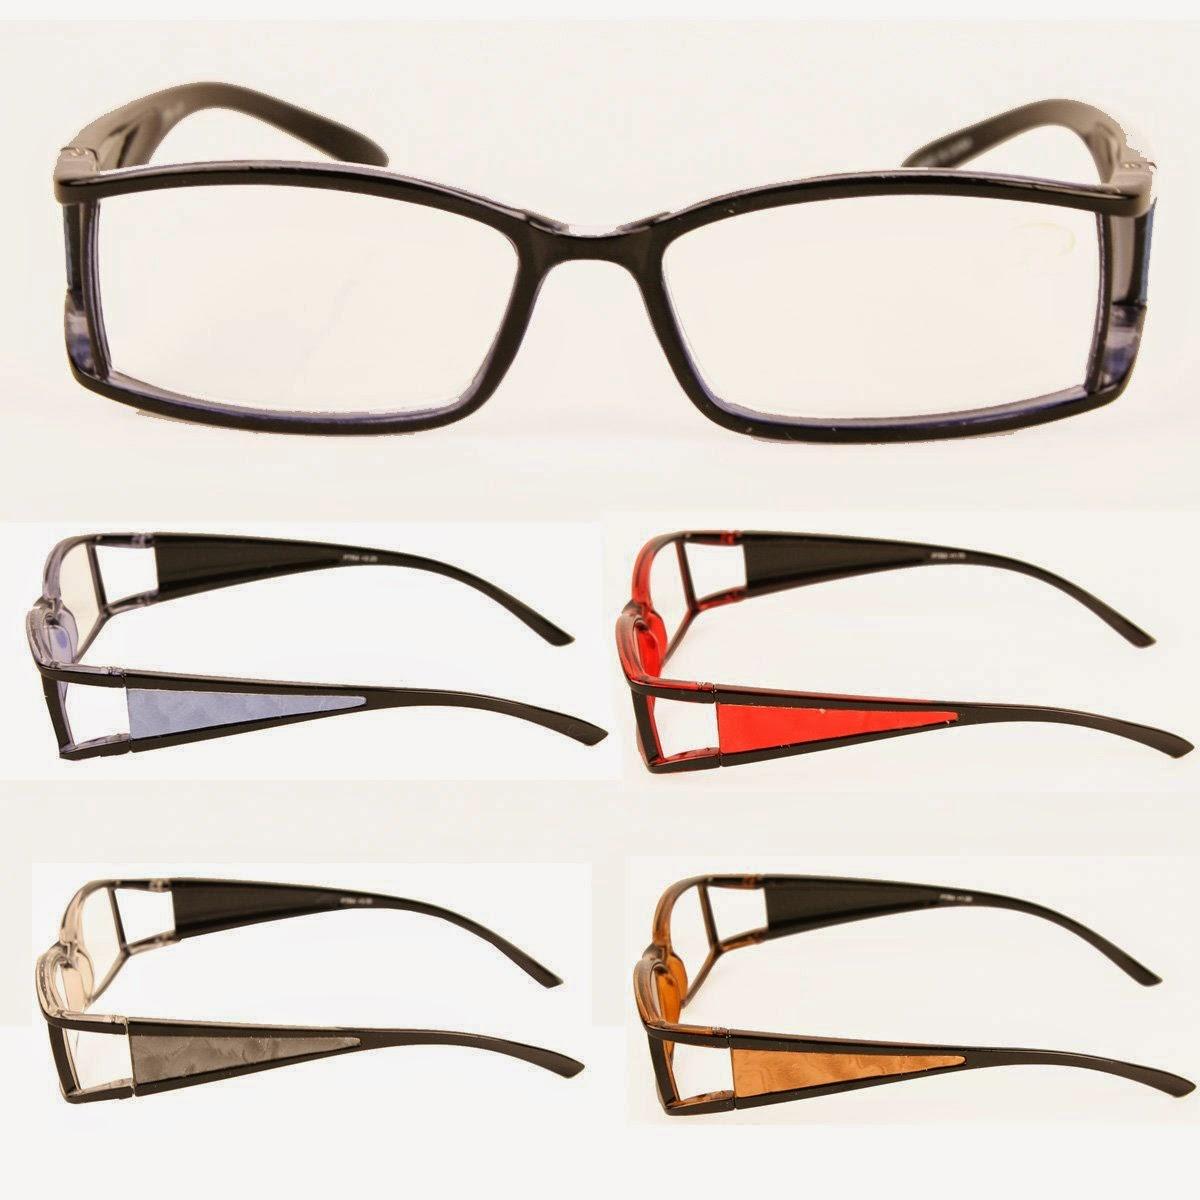 Trendy Eyeglass Frame Glasses Frames Fashions Feel ...